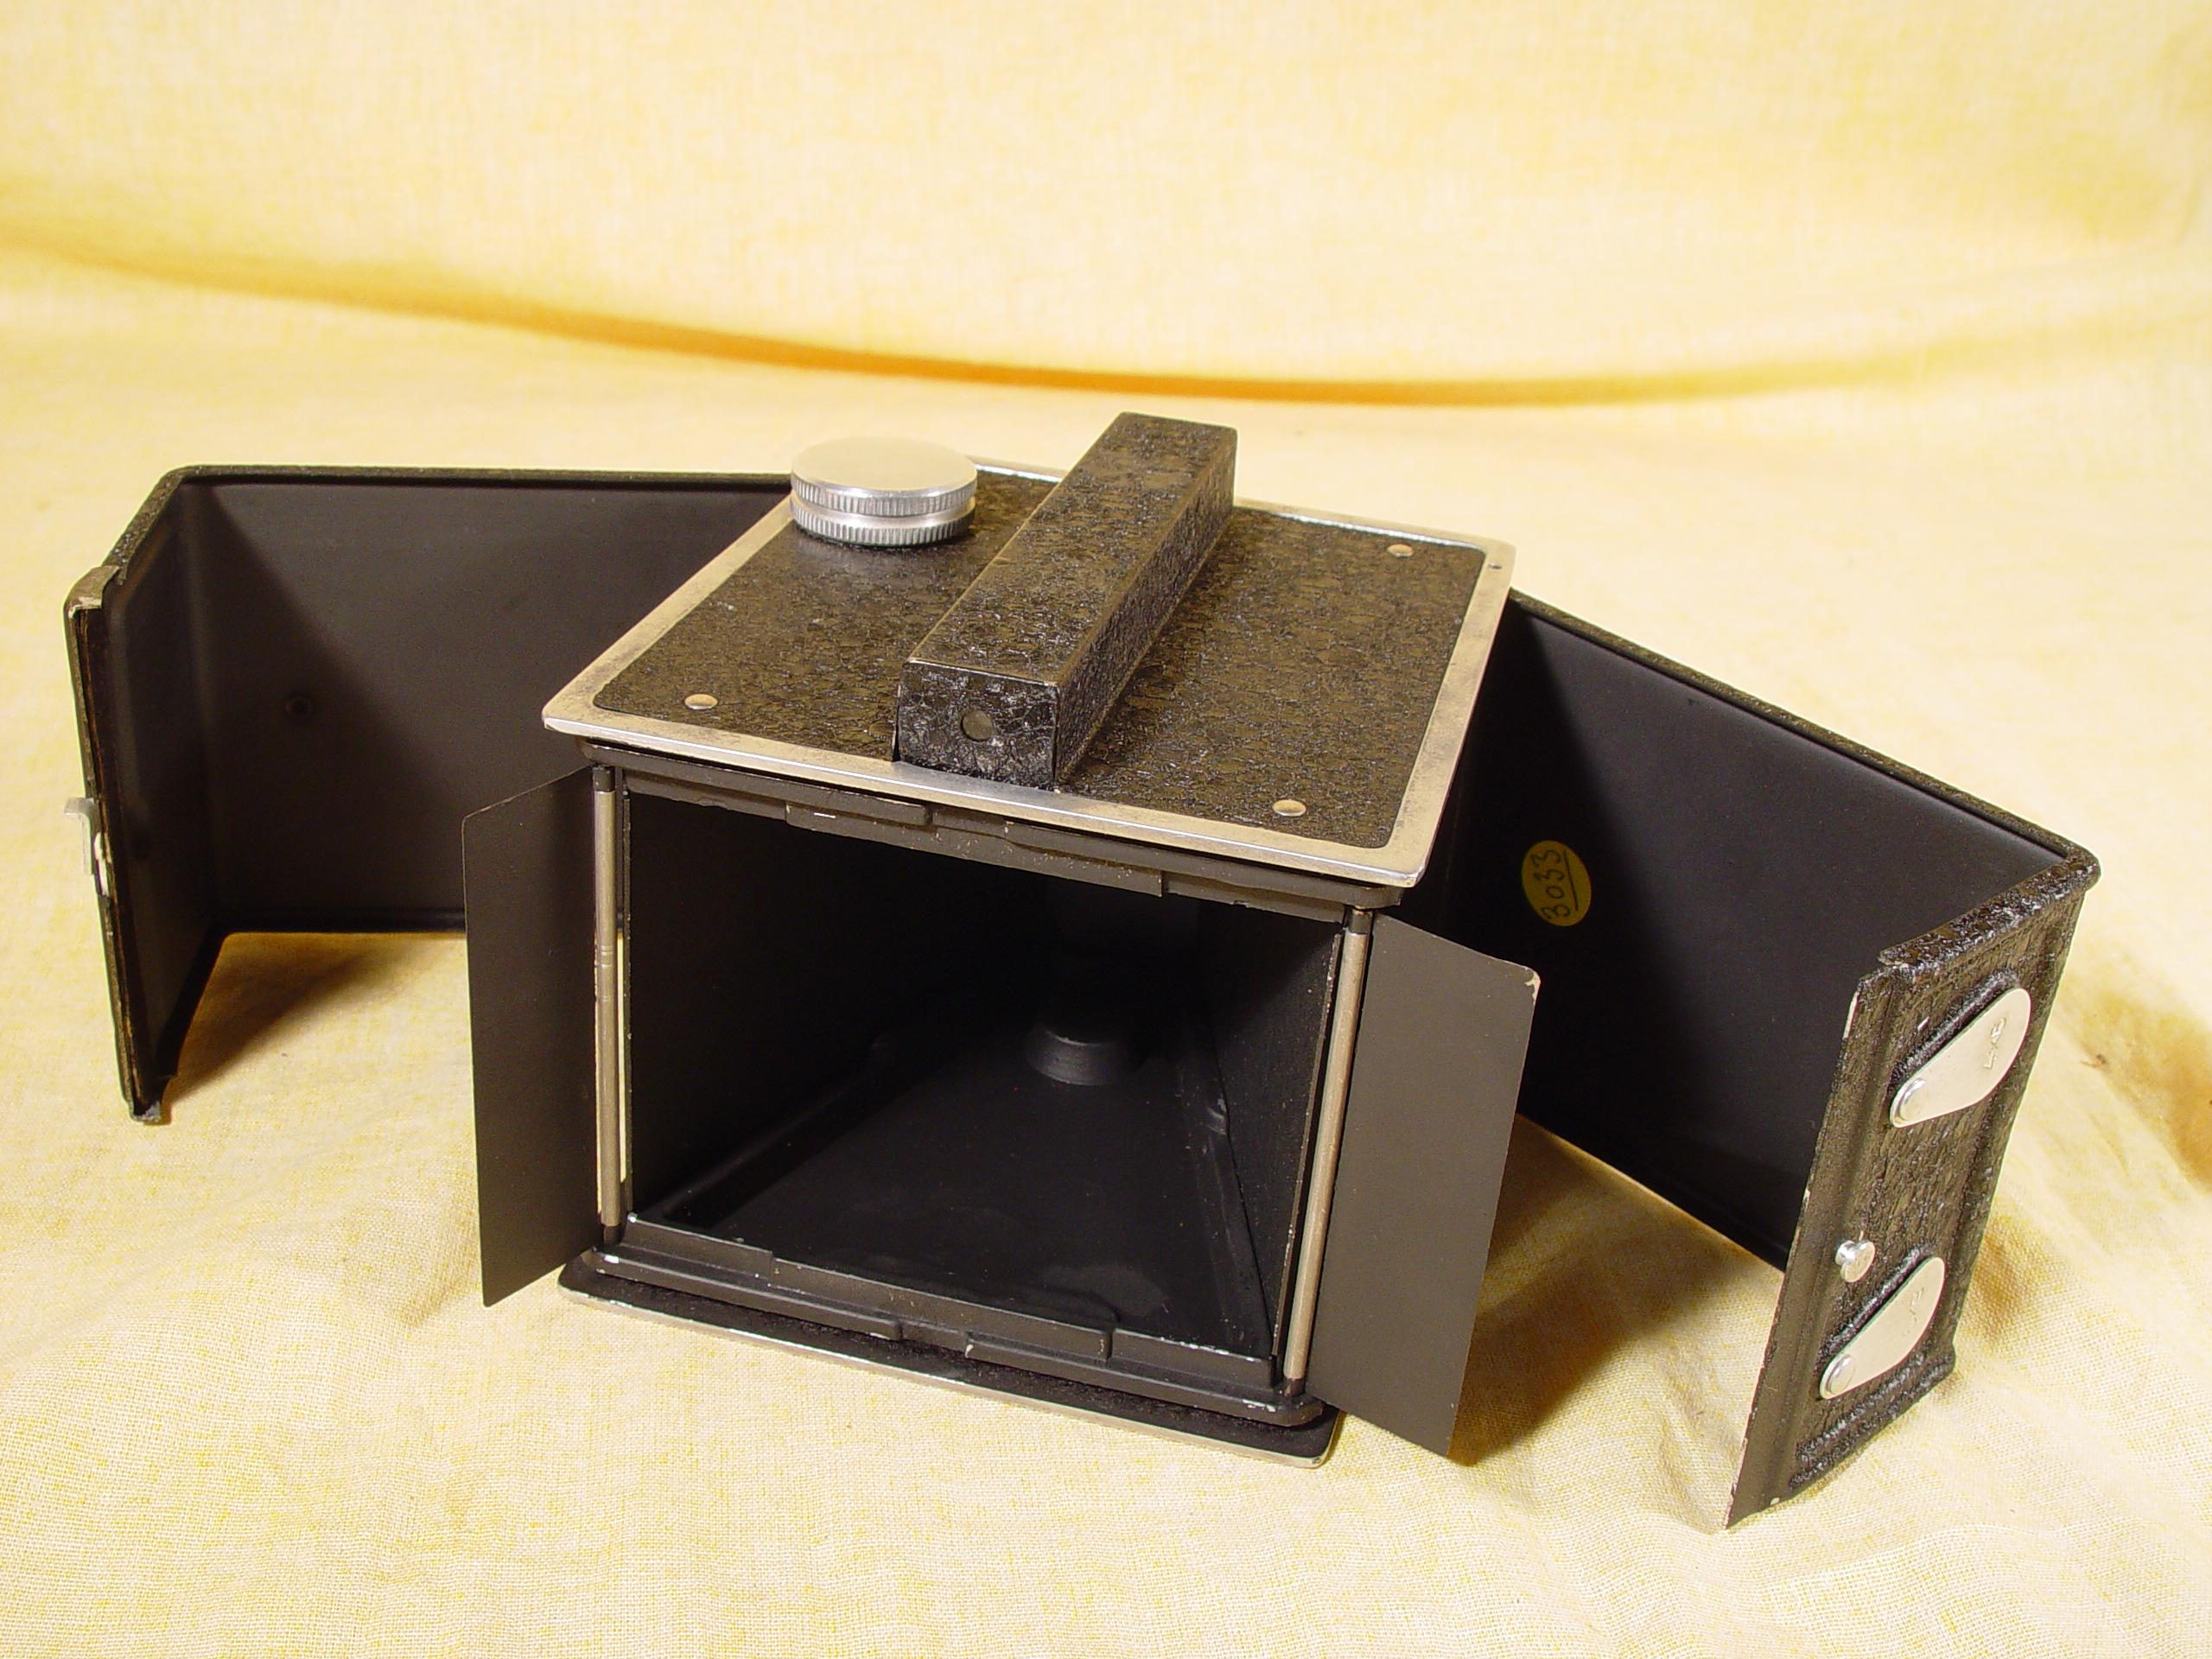 Wallpaper 3033-4 MIDELLY Demilly box modele de base, collection AMI Appareils photos